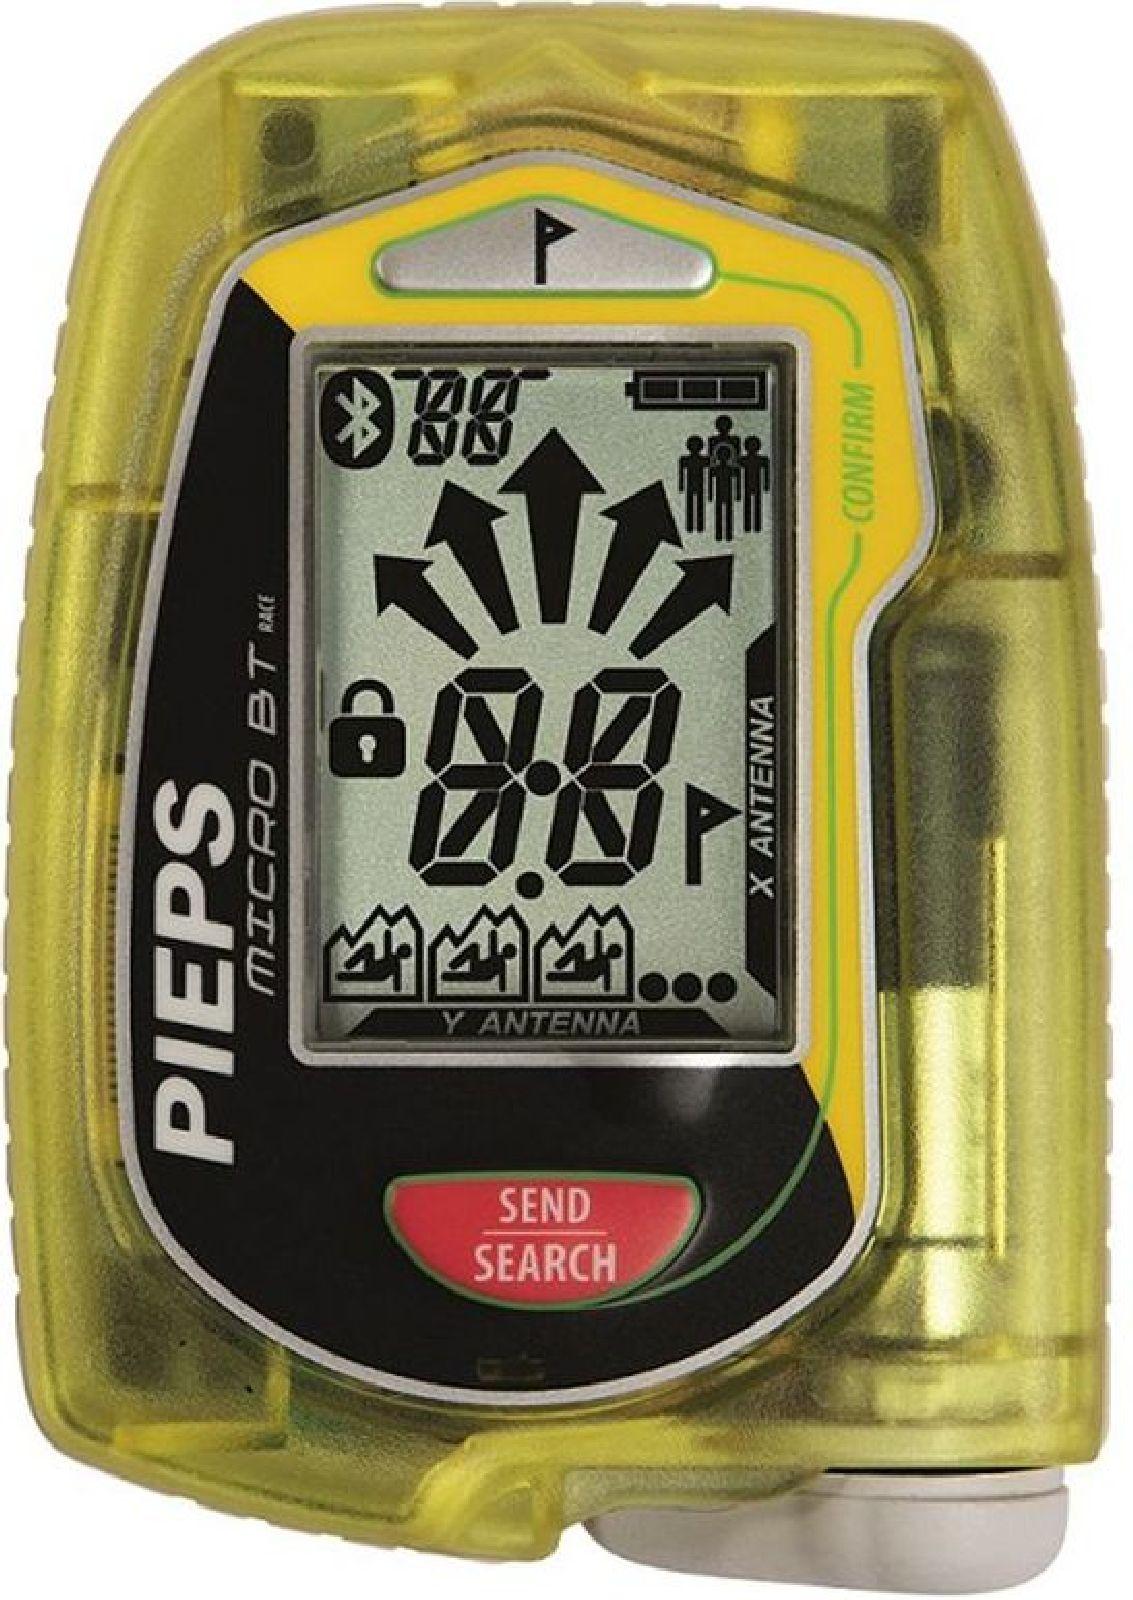 Pieps Micro BT Race - yellow/black race uni